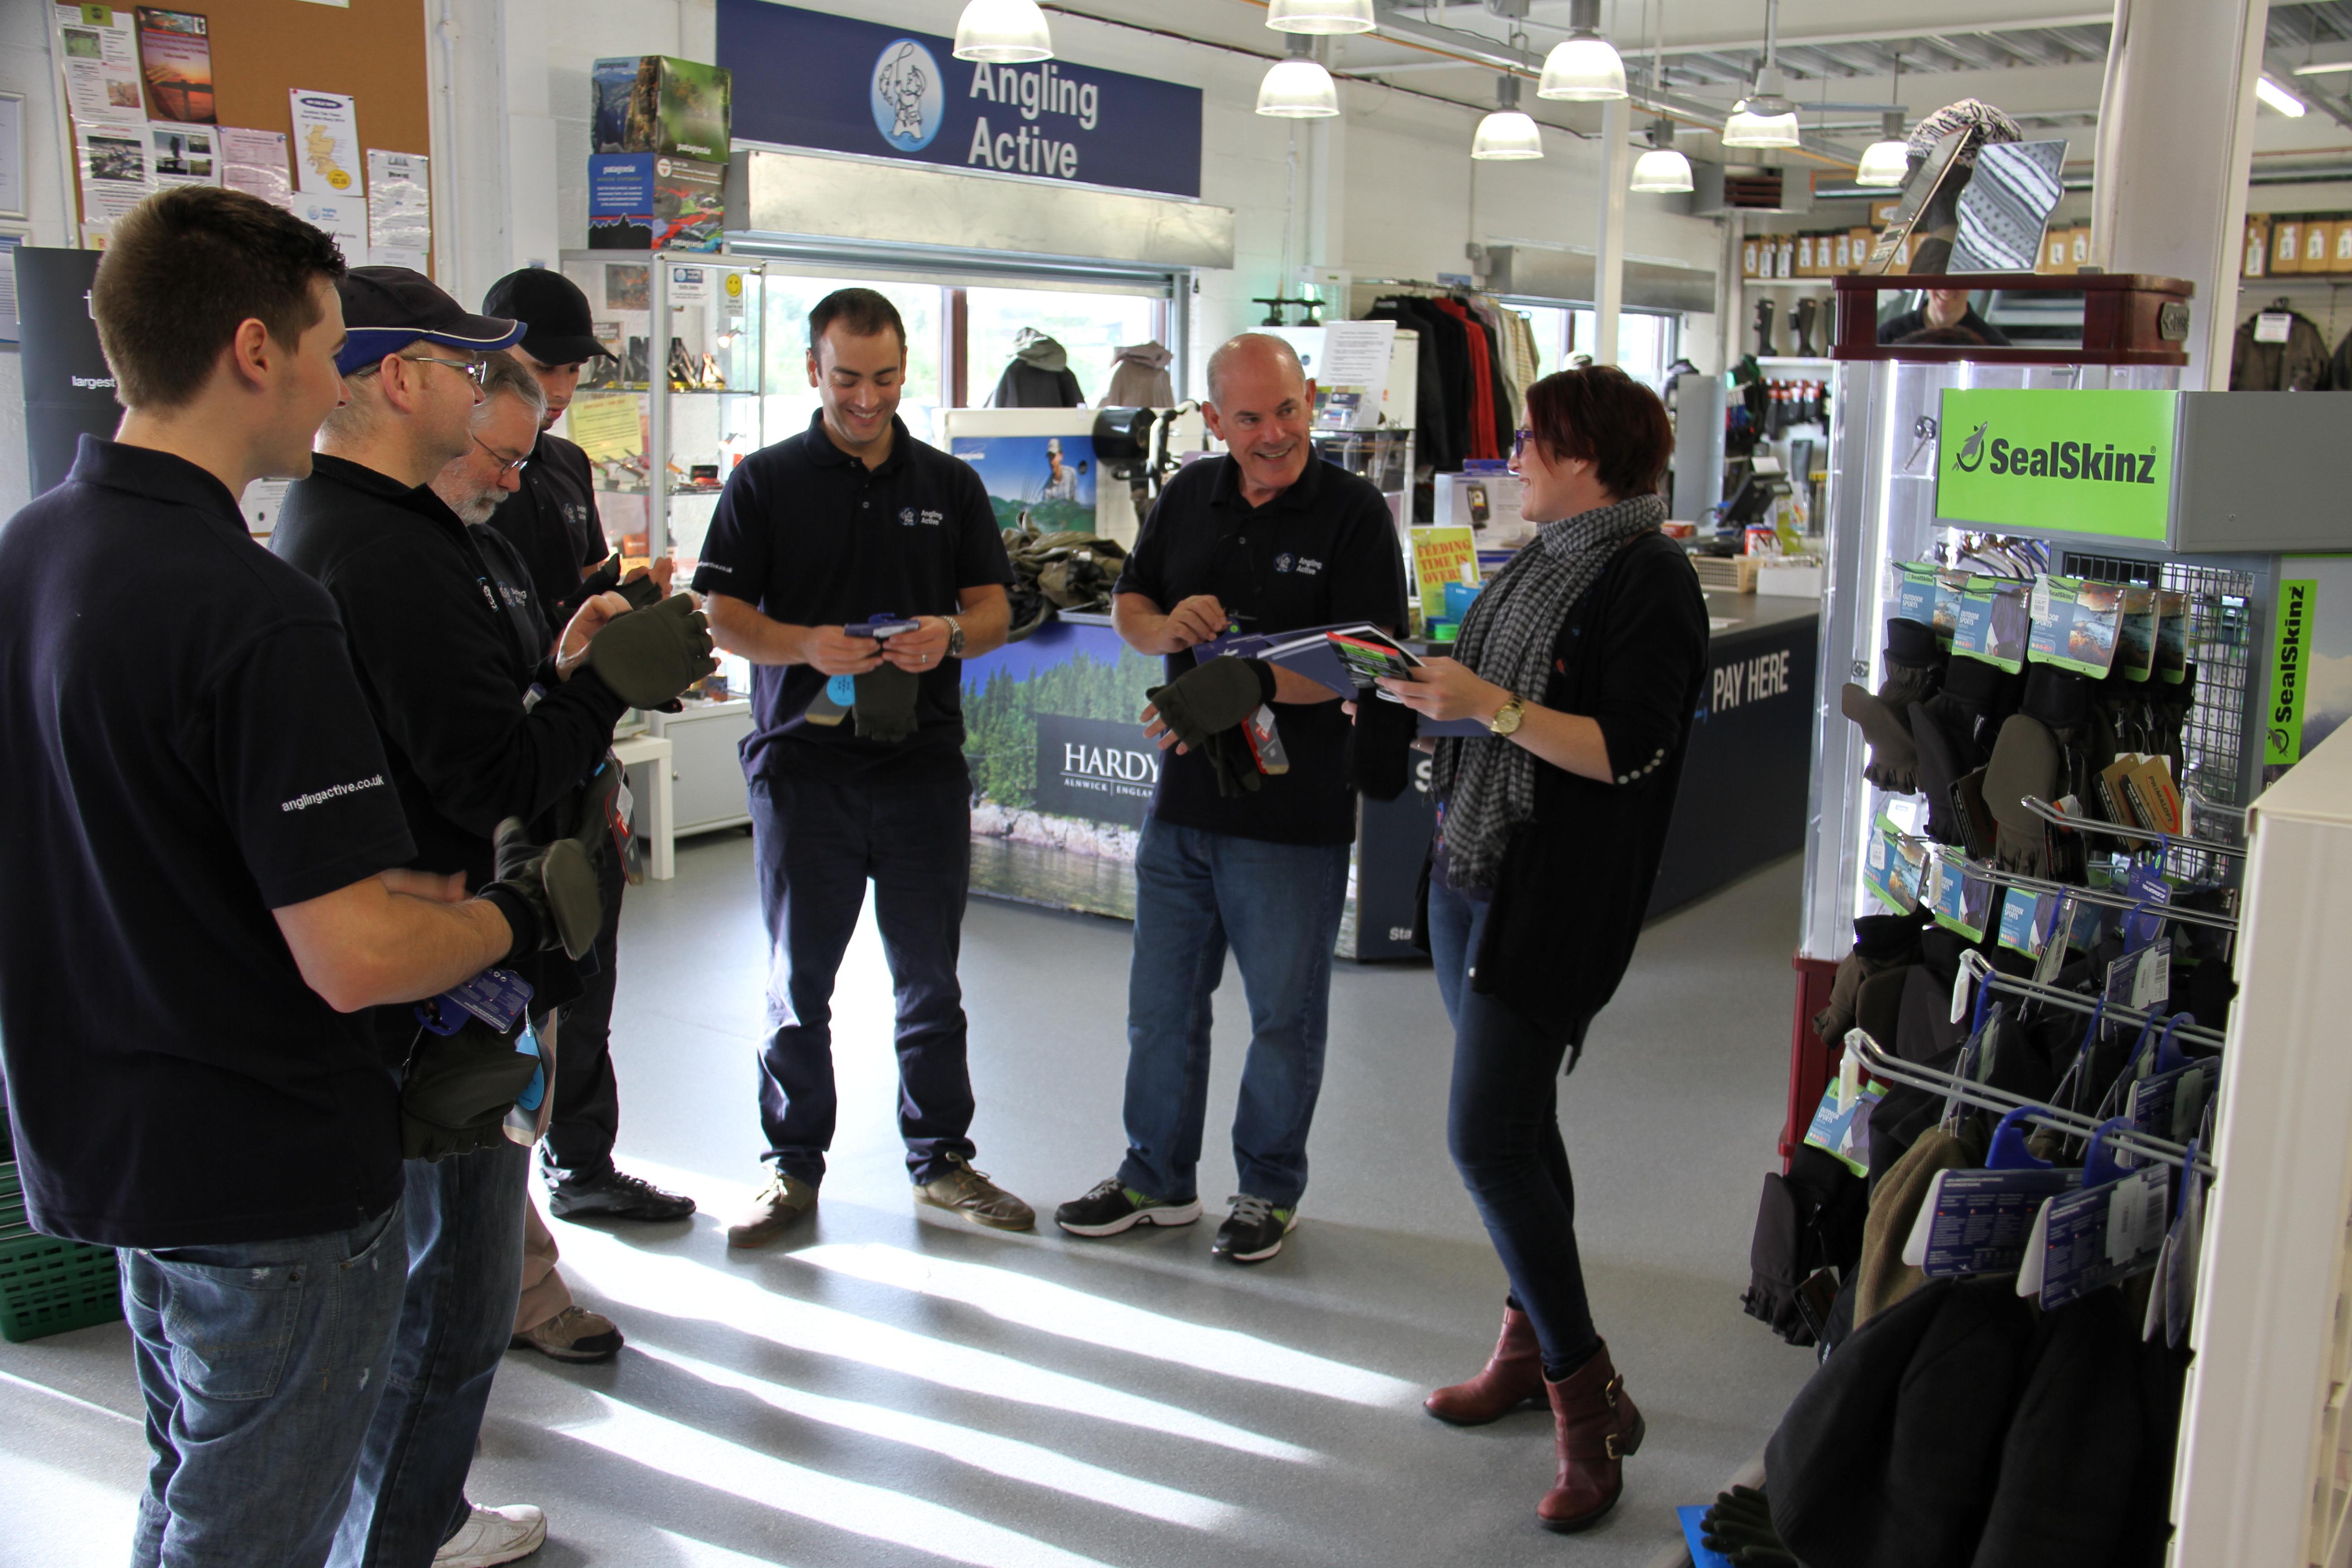 Shop floor lower interior image